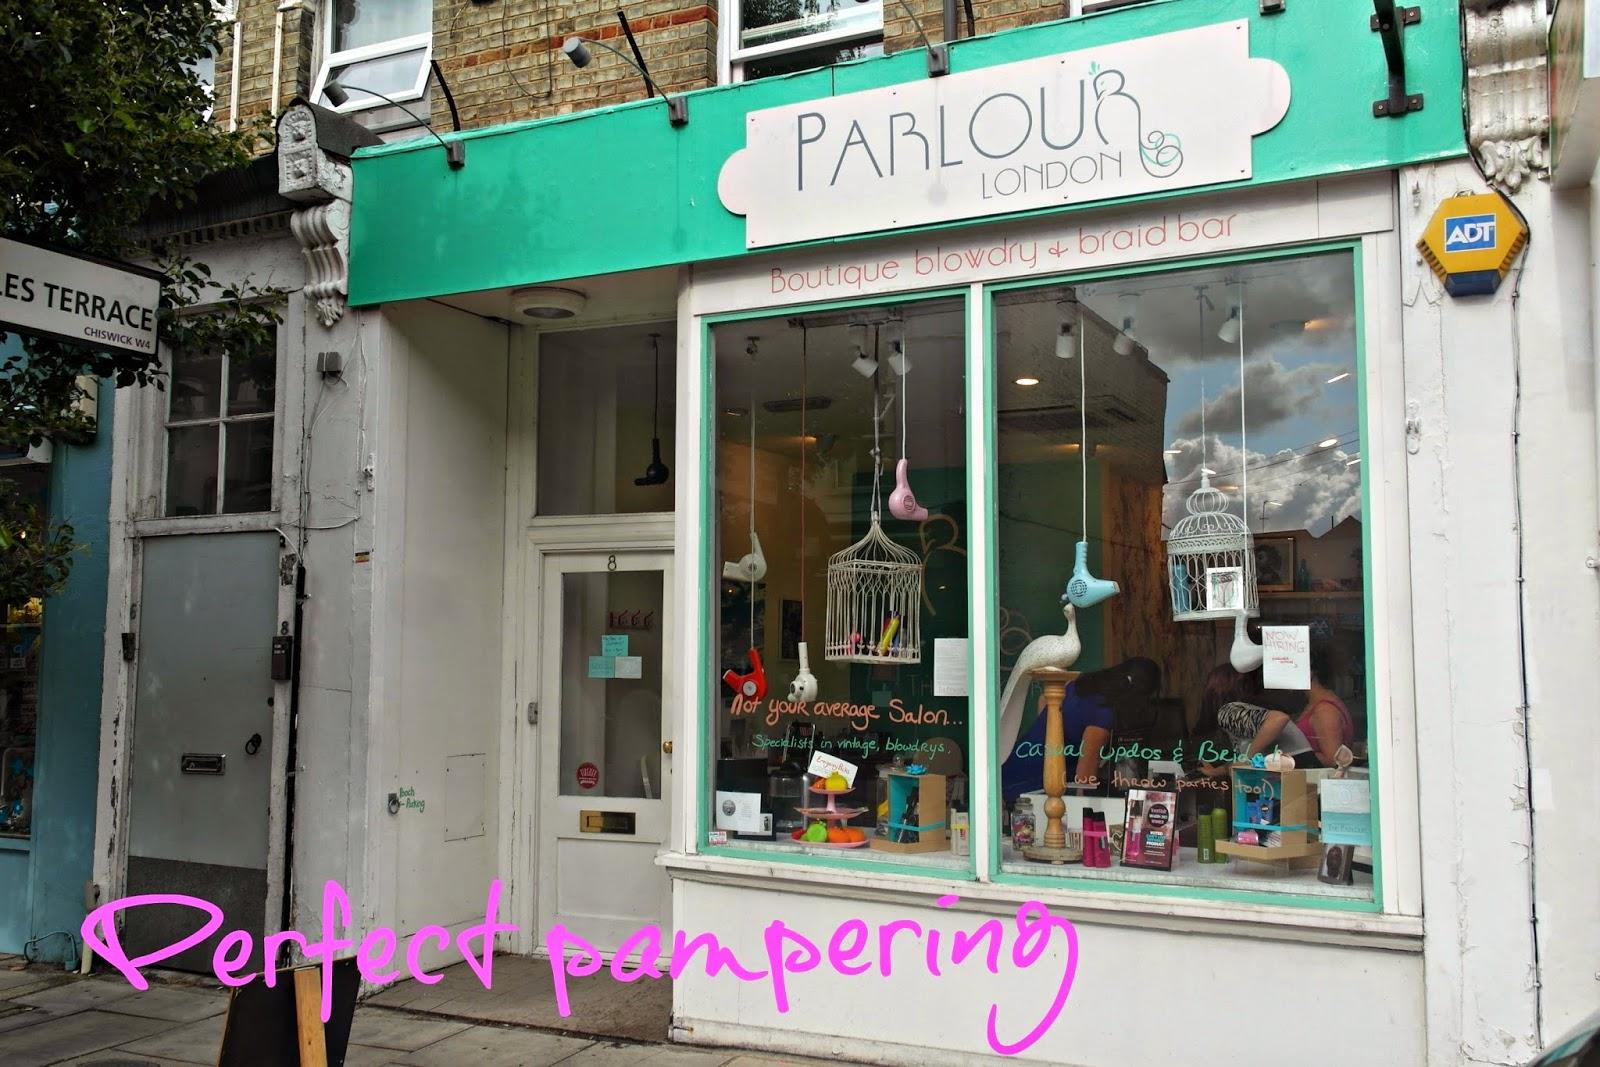 The Parlour London review